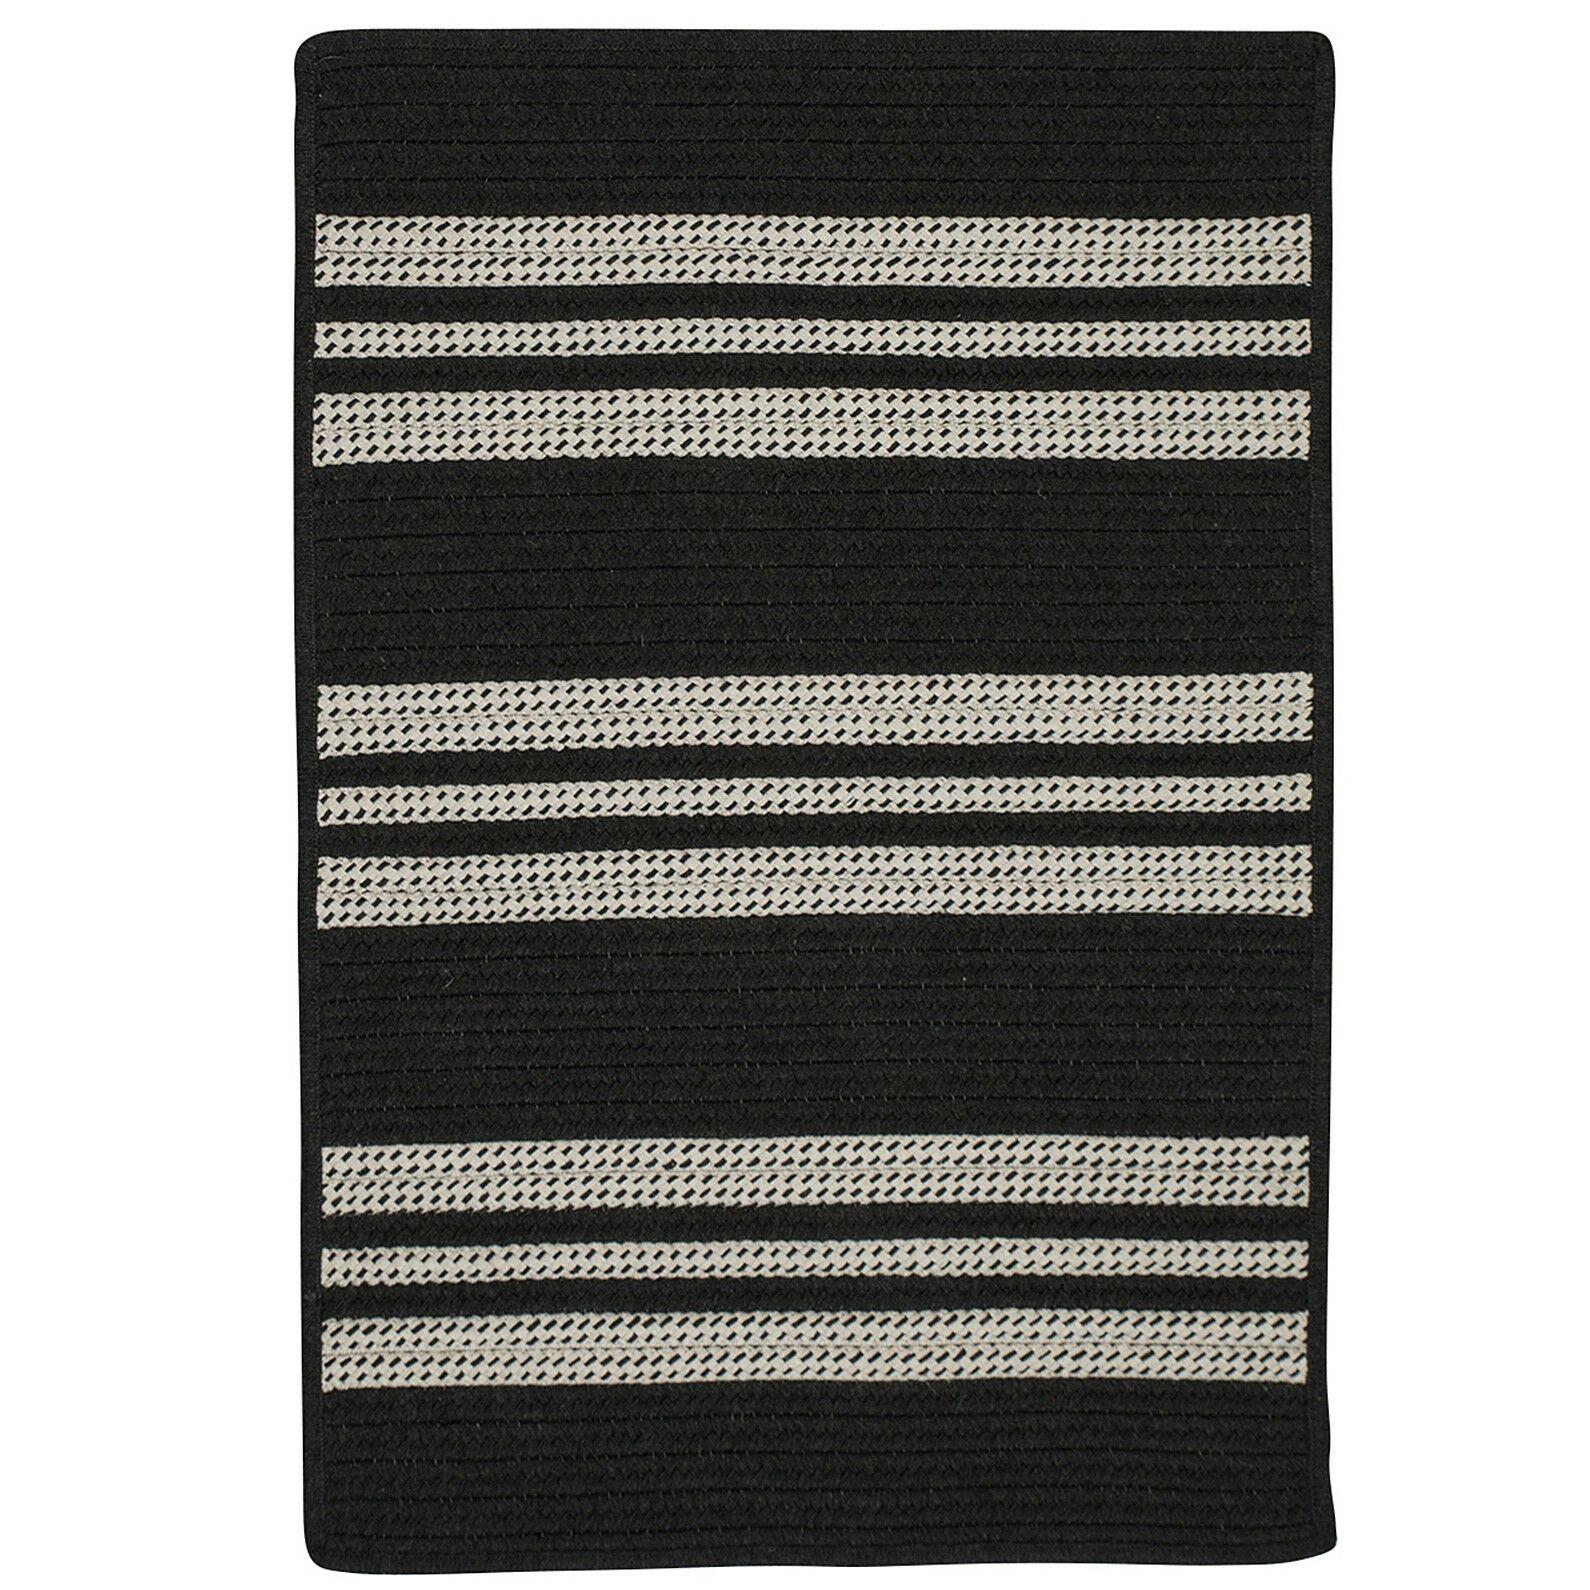 Neponset Hand-Woven Black Indoor/Outdoor Area Rug Rug Size: 8' x 10'